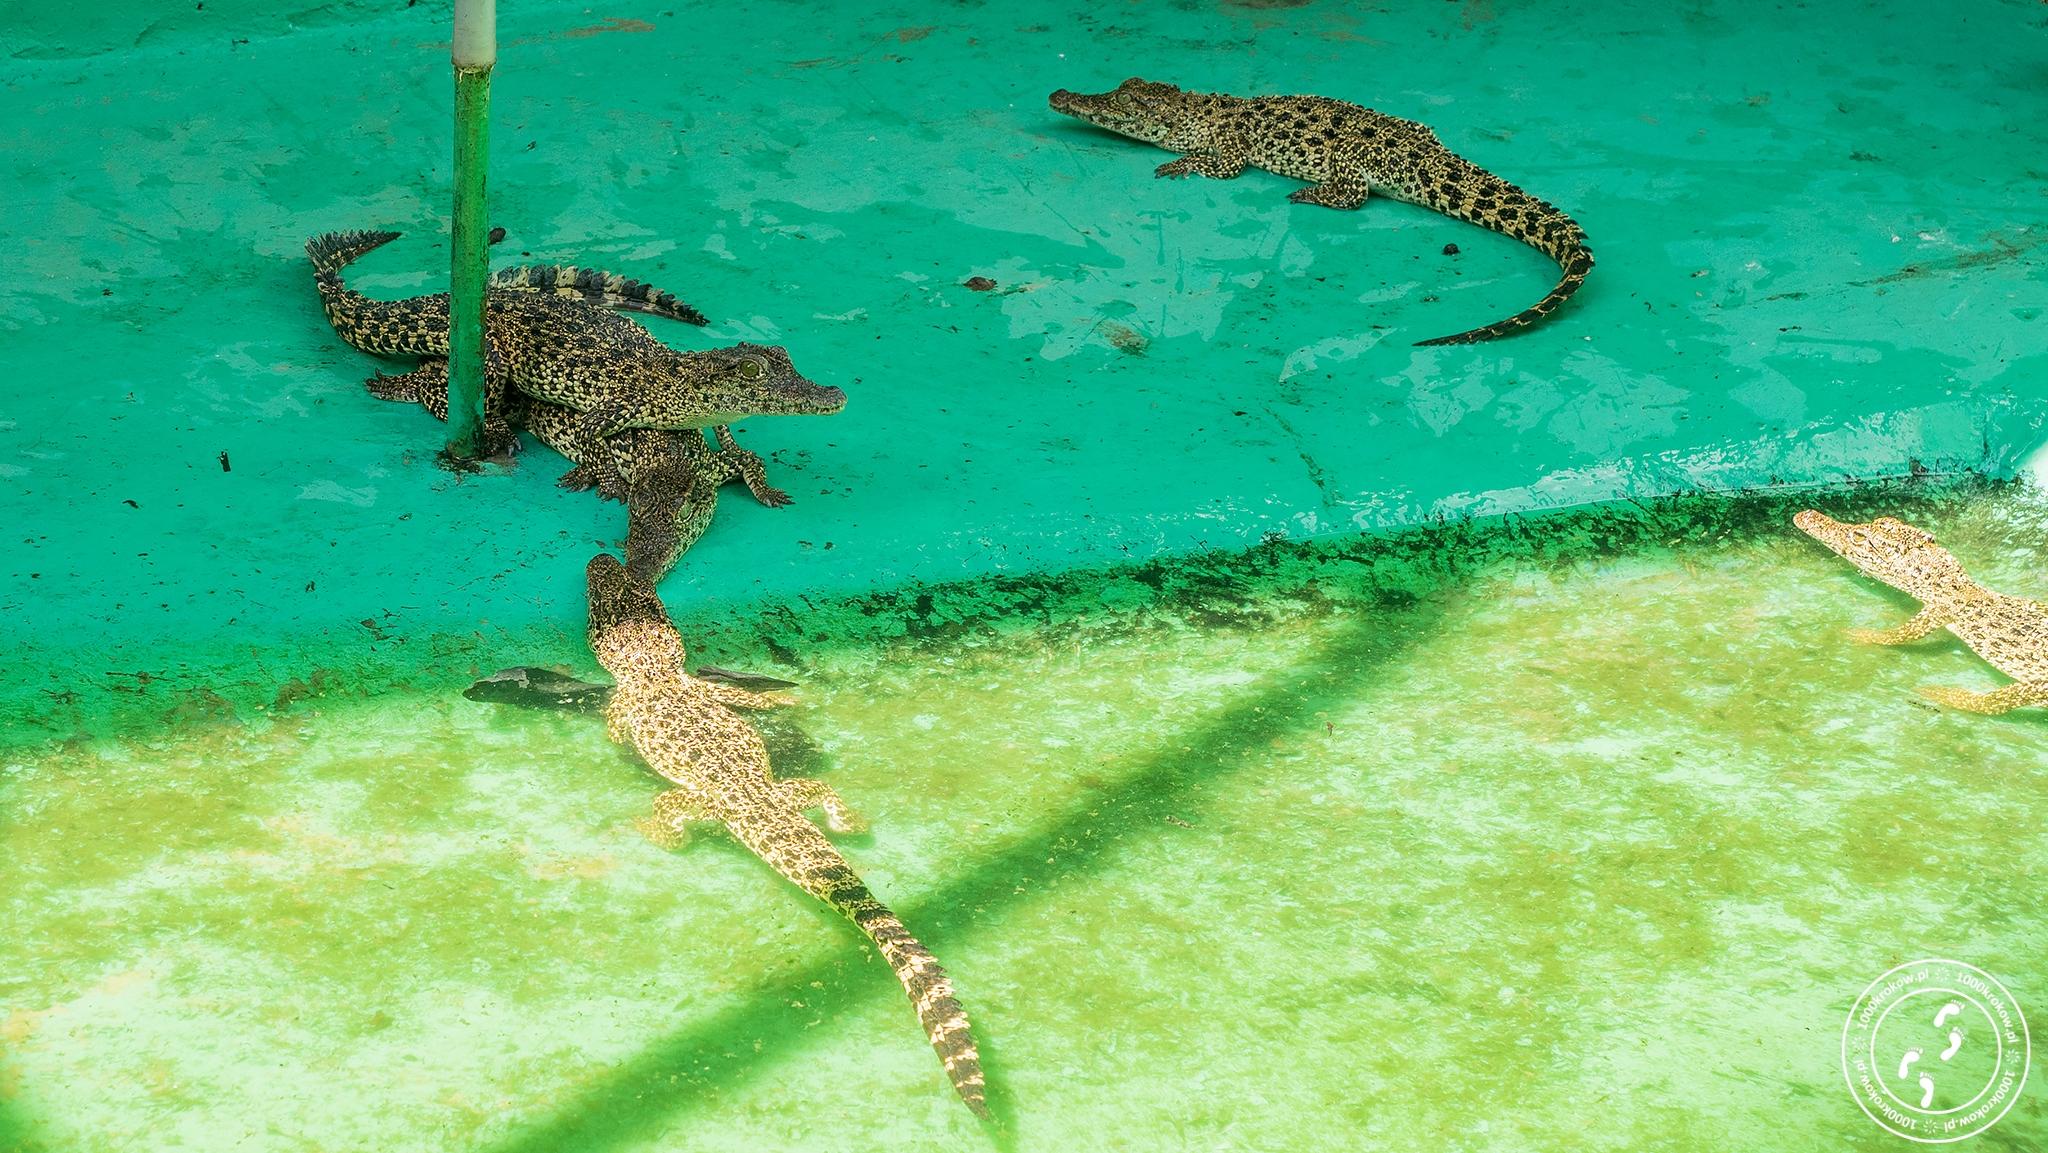 Criadero de Crocodiles